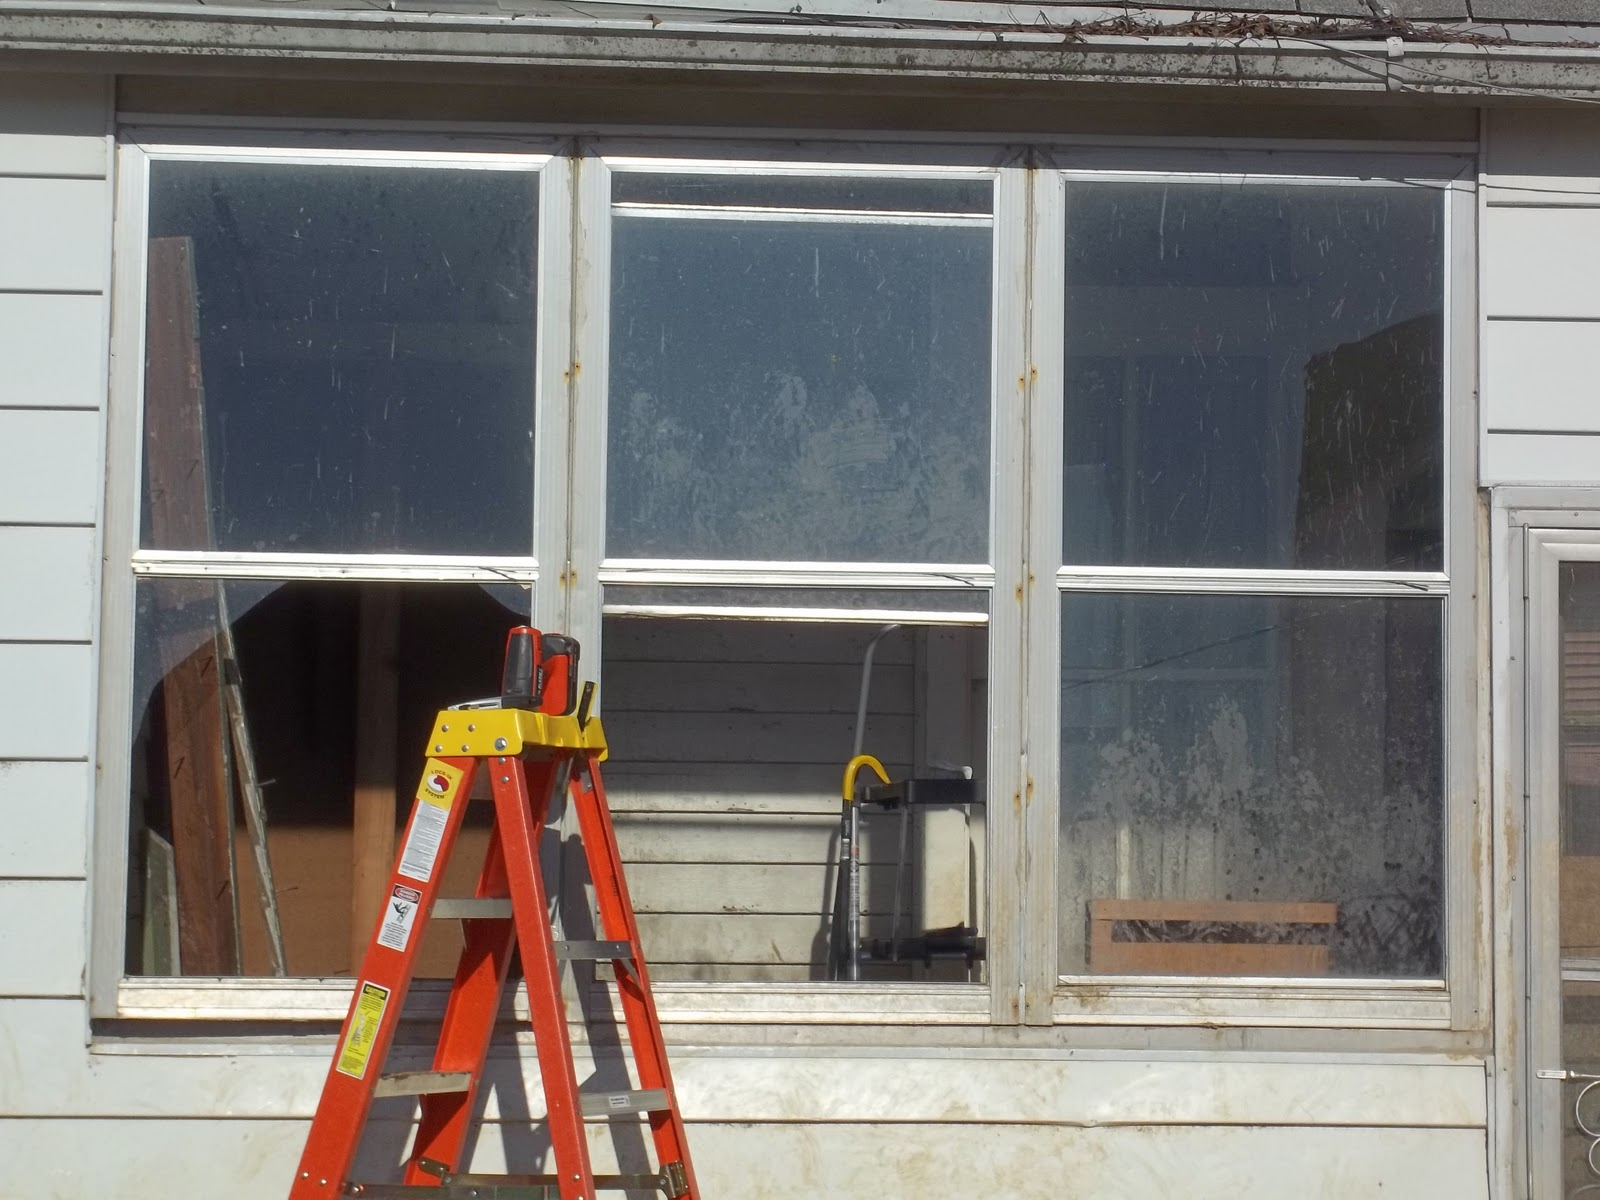 farm girl vs farm house part 1 window framing and no installation - Window Framing